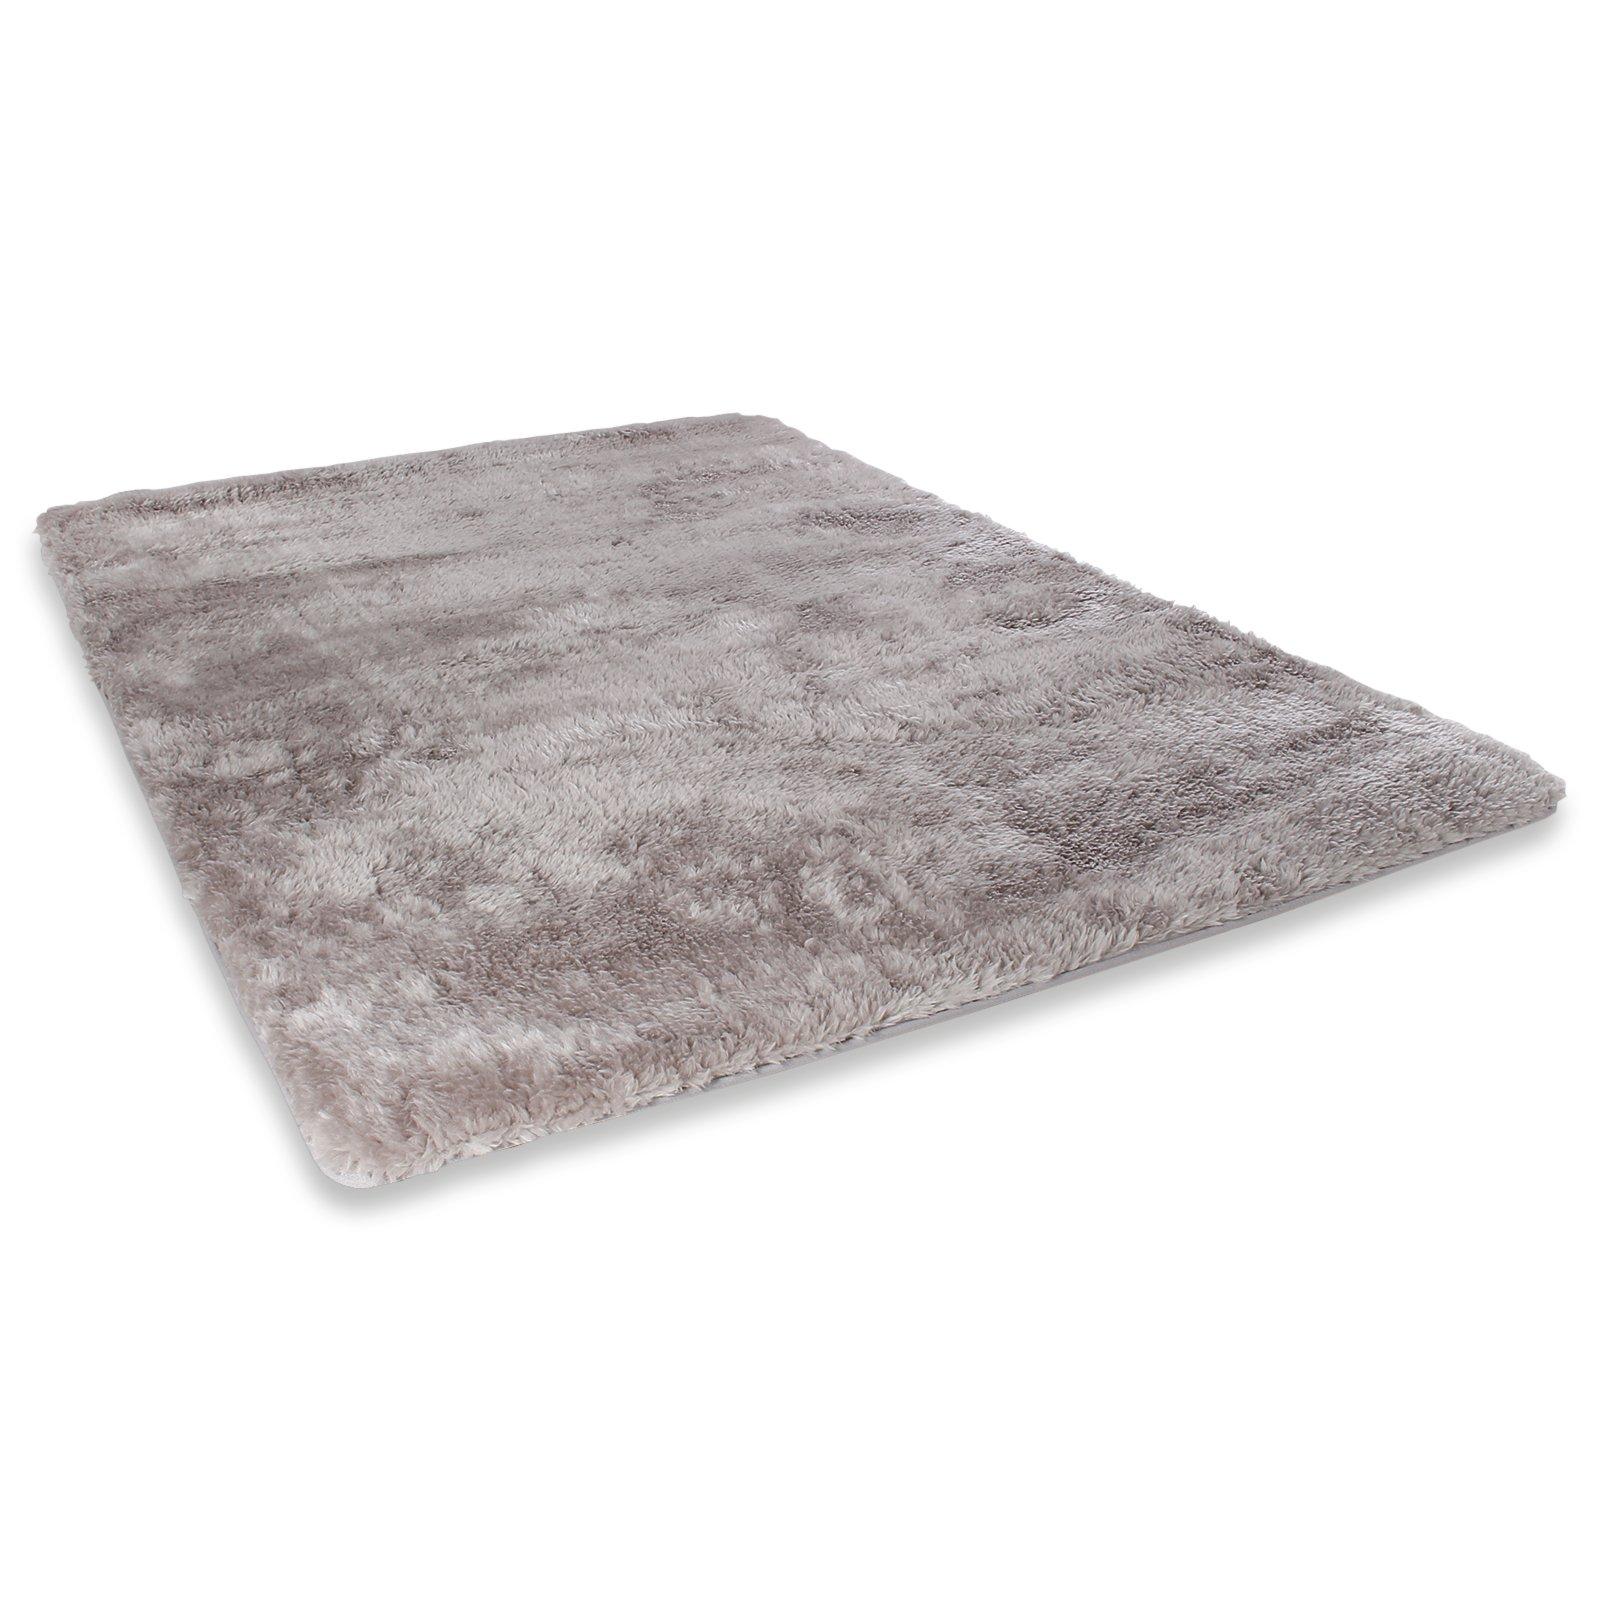 teppich softy grau 120x170 cm einfarbige teppiche. Black Bedroom Furniture Sets. Home Design Ideas